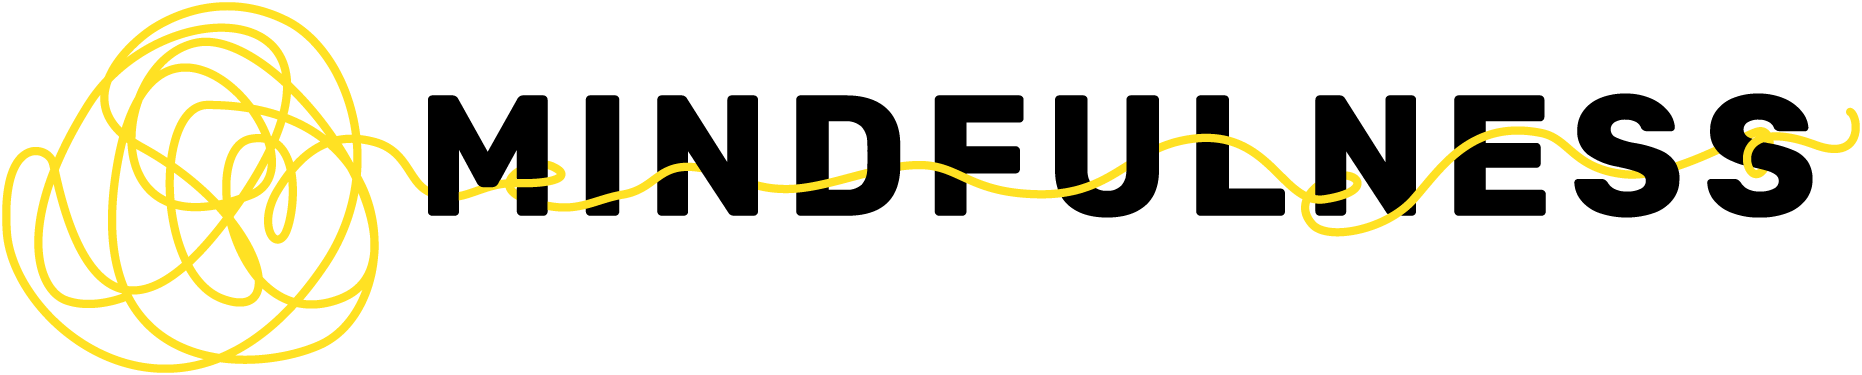 Mindfulness Logo RGB 1 zeilig Schwarz bigger